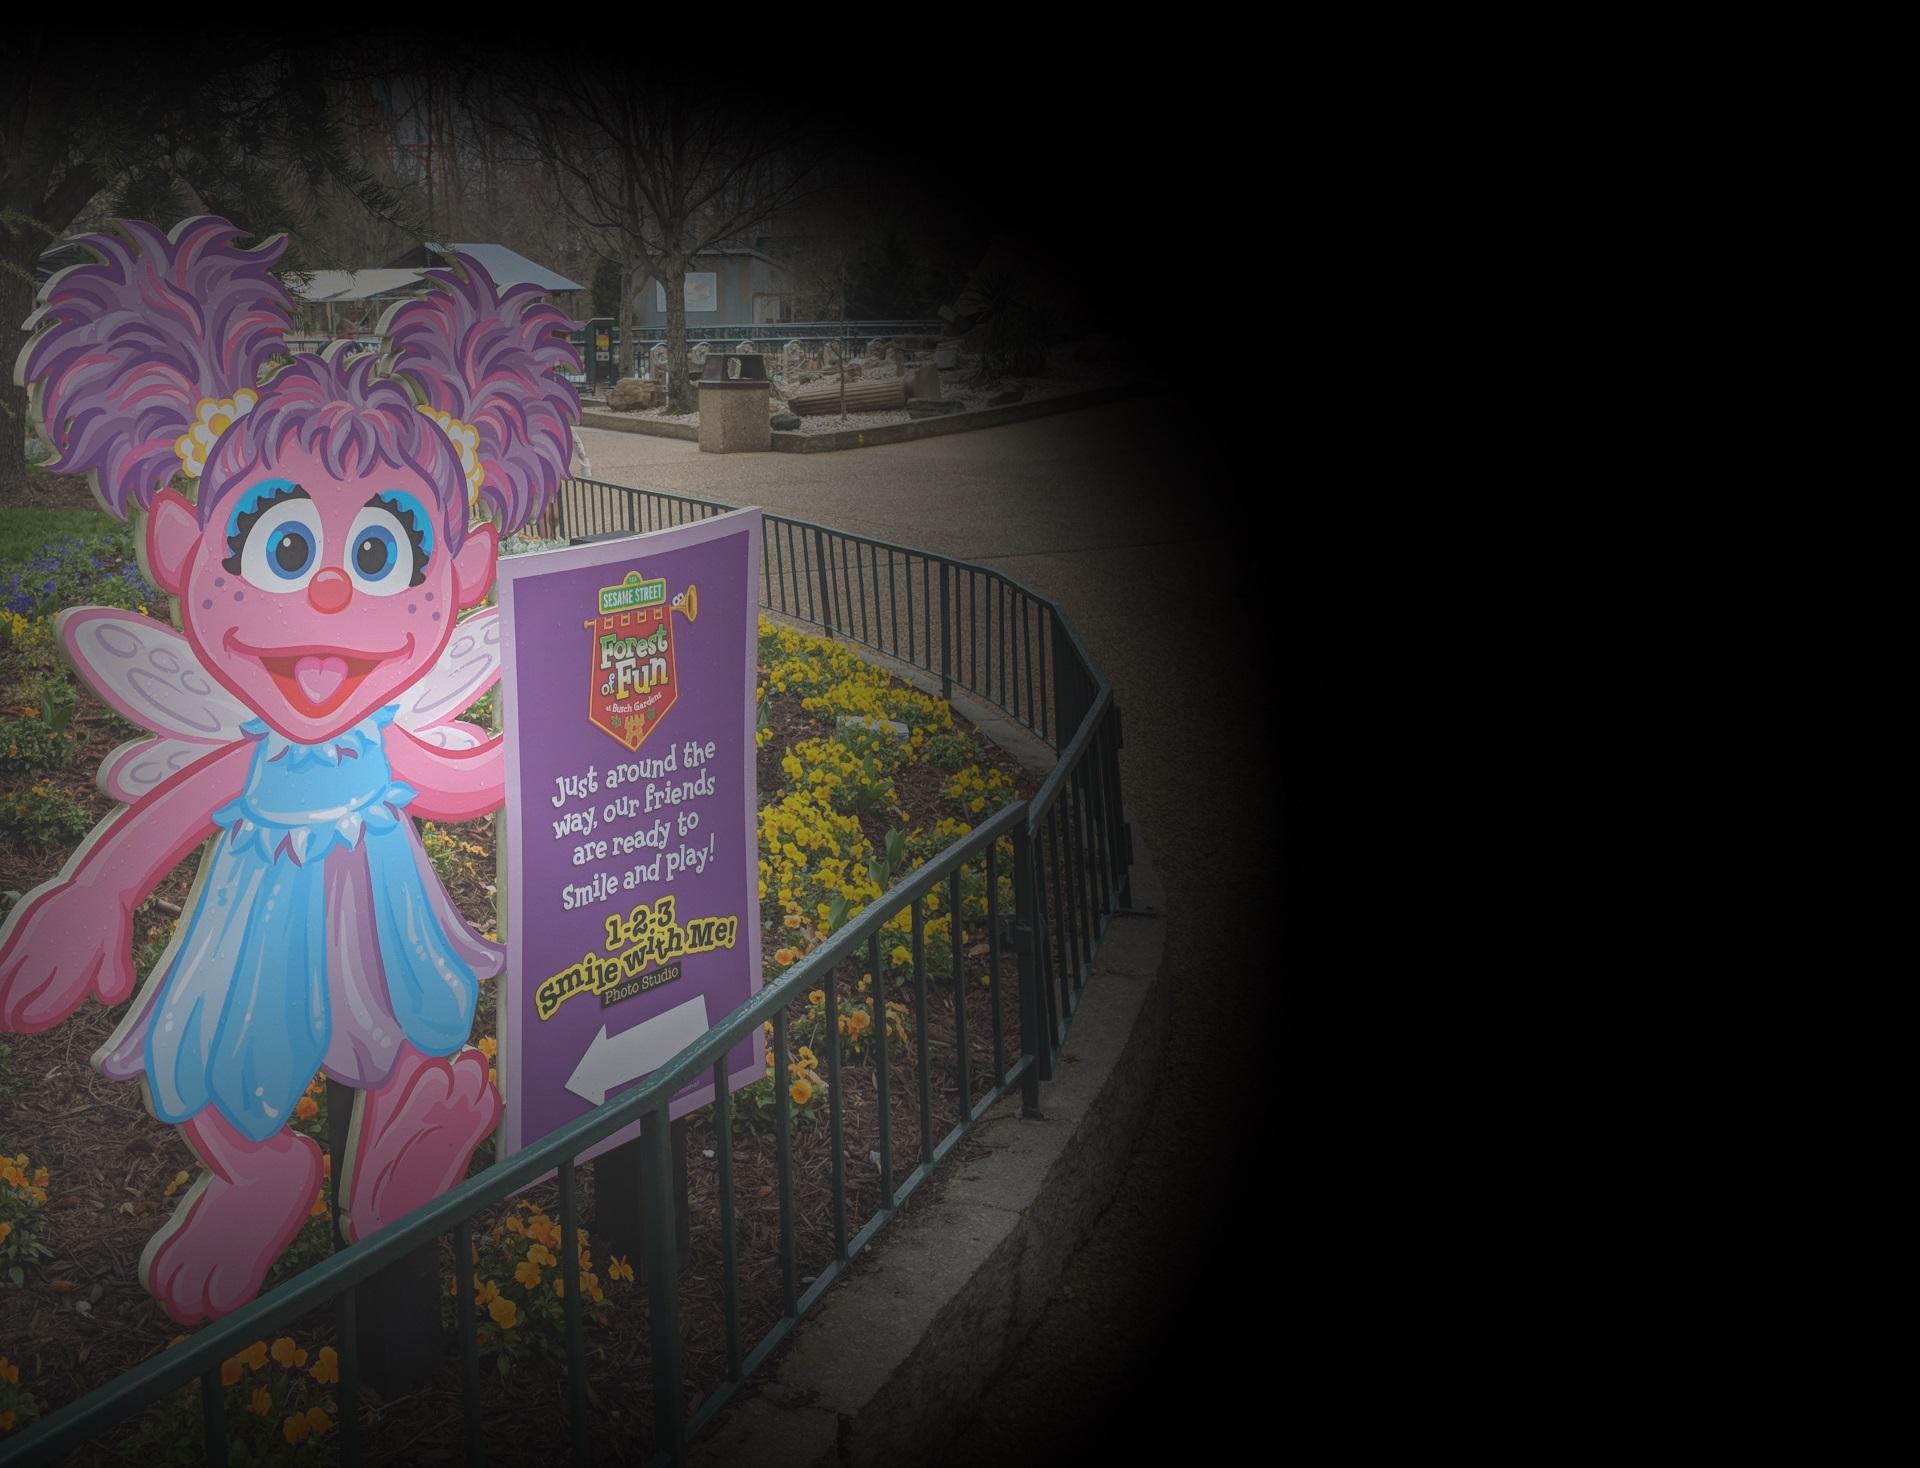 Sesame Place Williamsburg: Pros & Cons